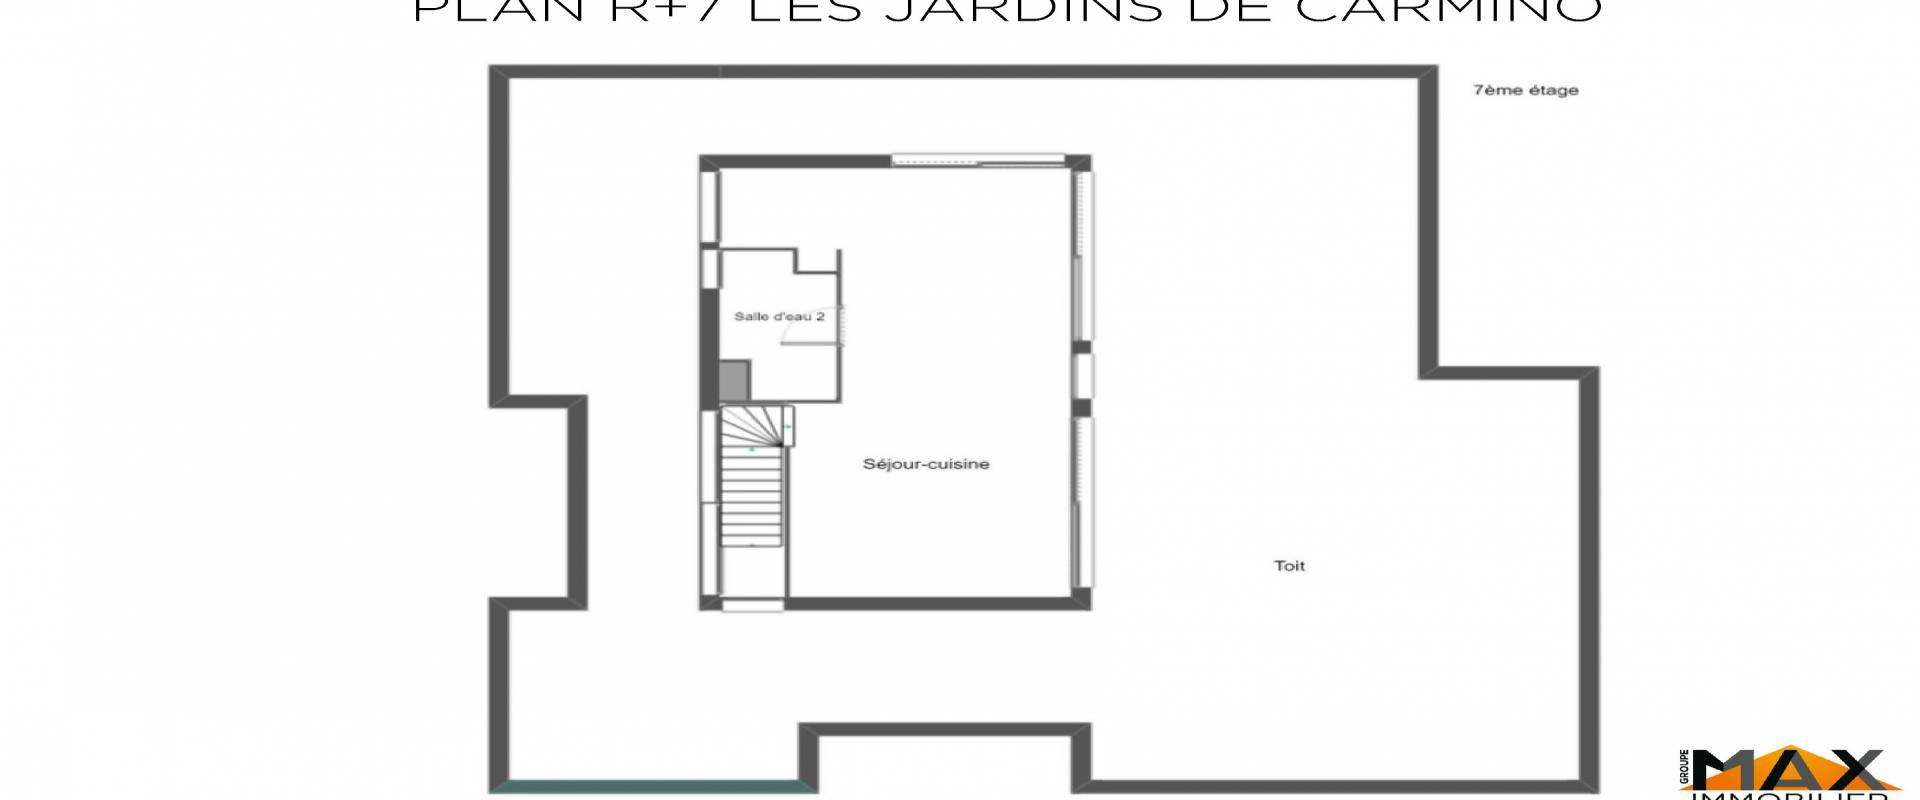 PLAN R+7 DUPLEX LES JARDINS DE CARMINO